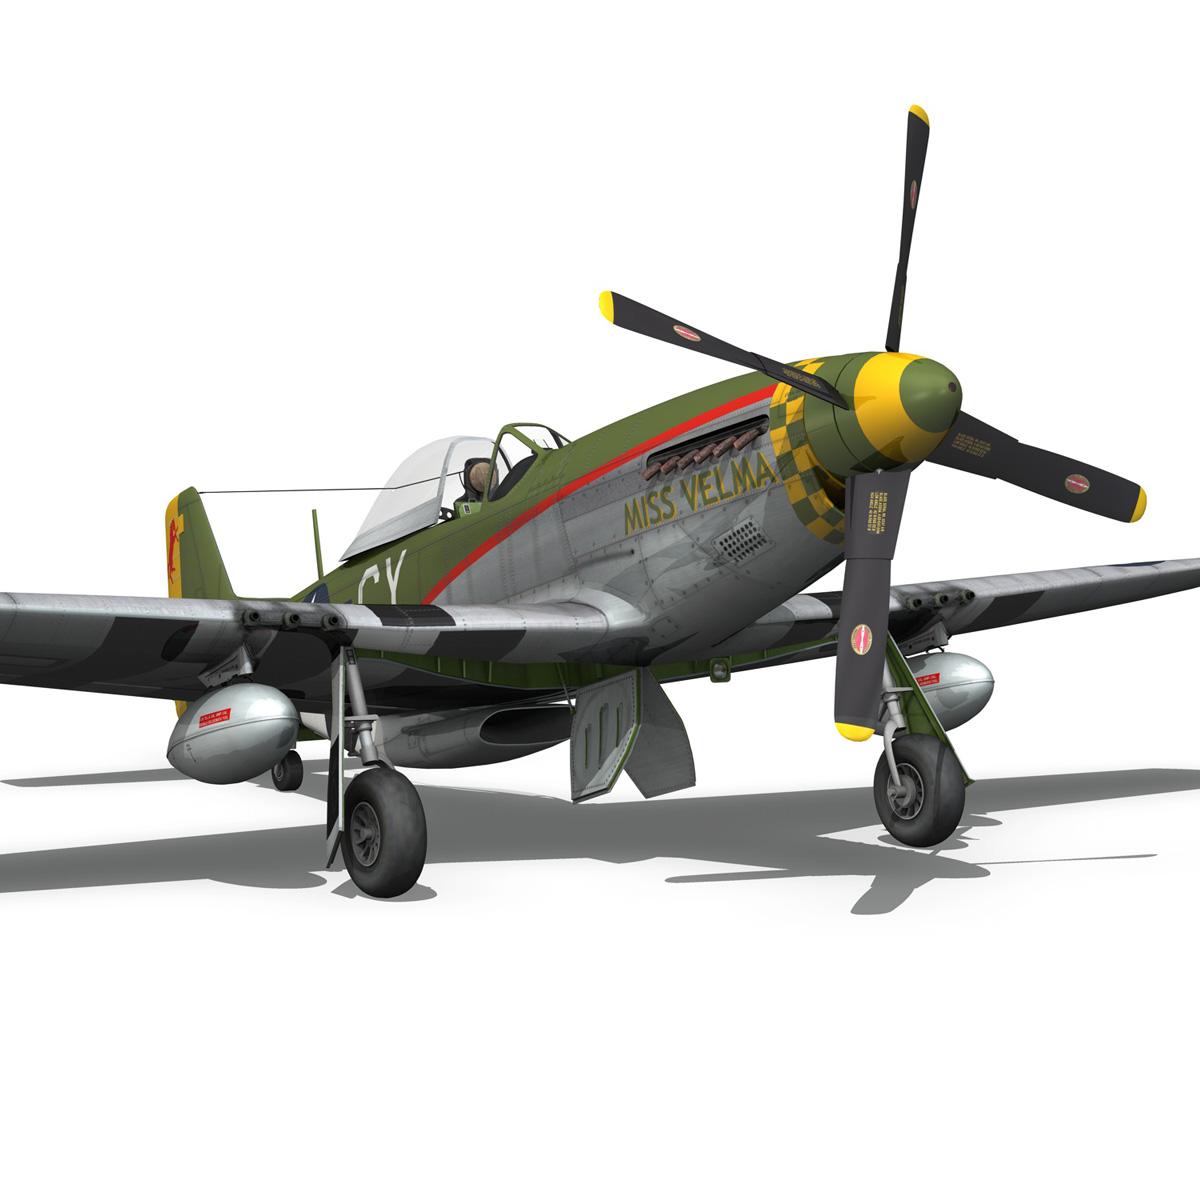 north american p-51d – mustang – miss velma 3d model 3ds fbx c4d lwo obj 267632